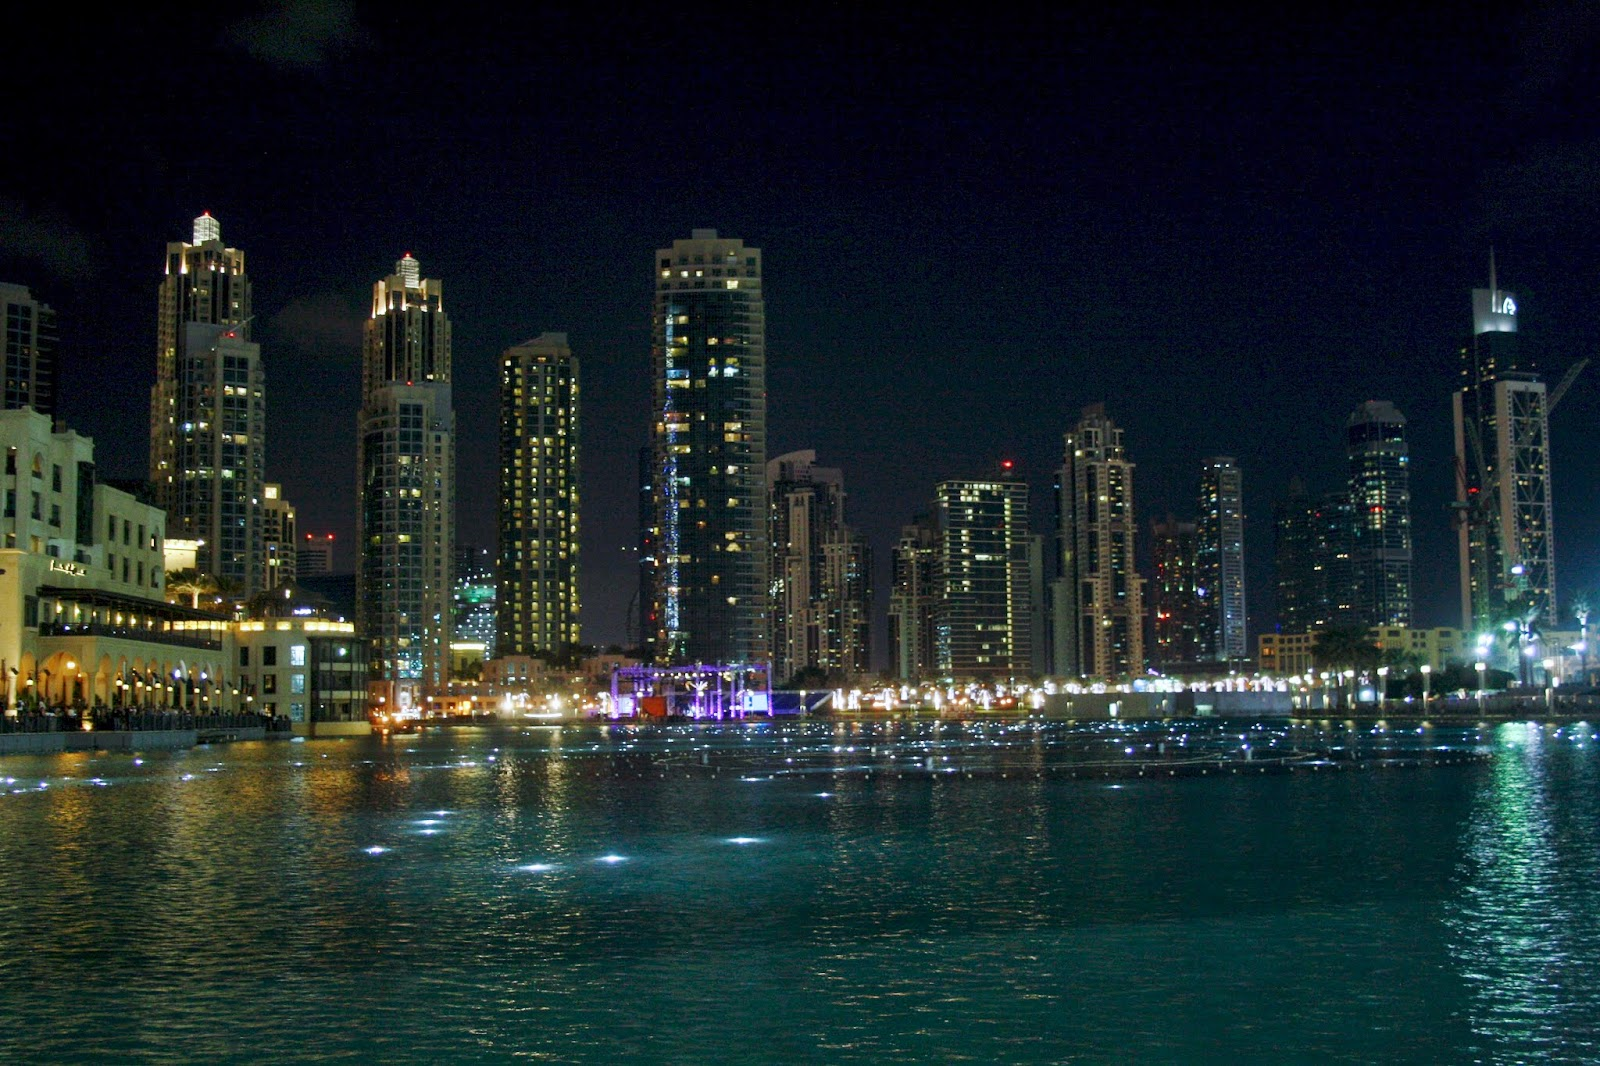 DUBAI PHOTO DIARY I. 48